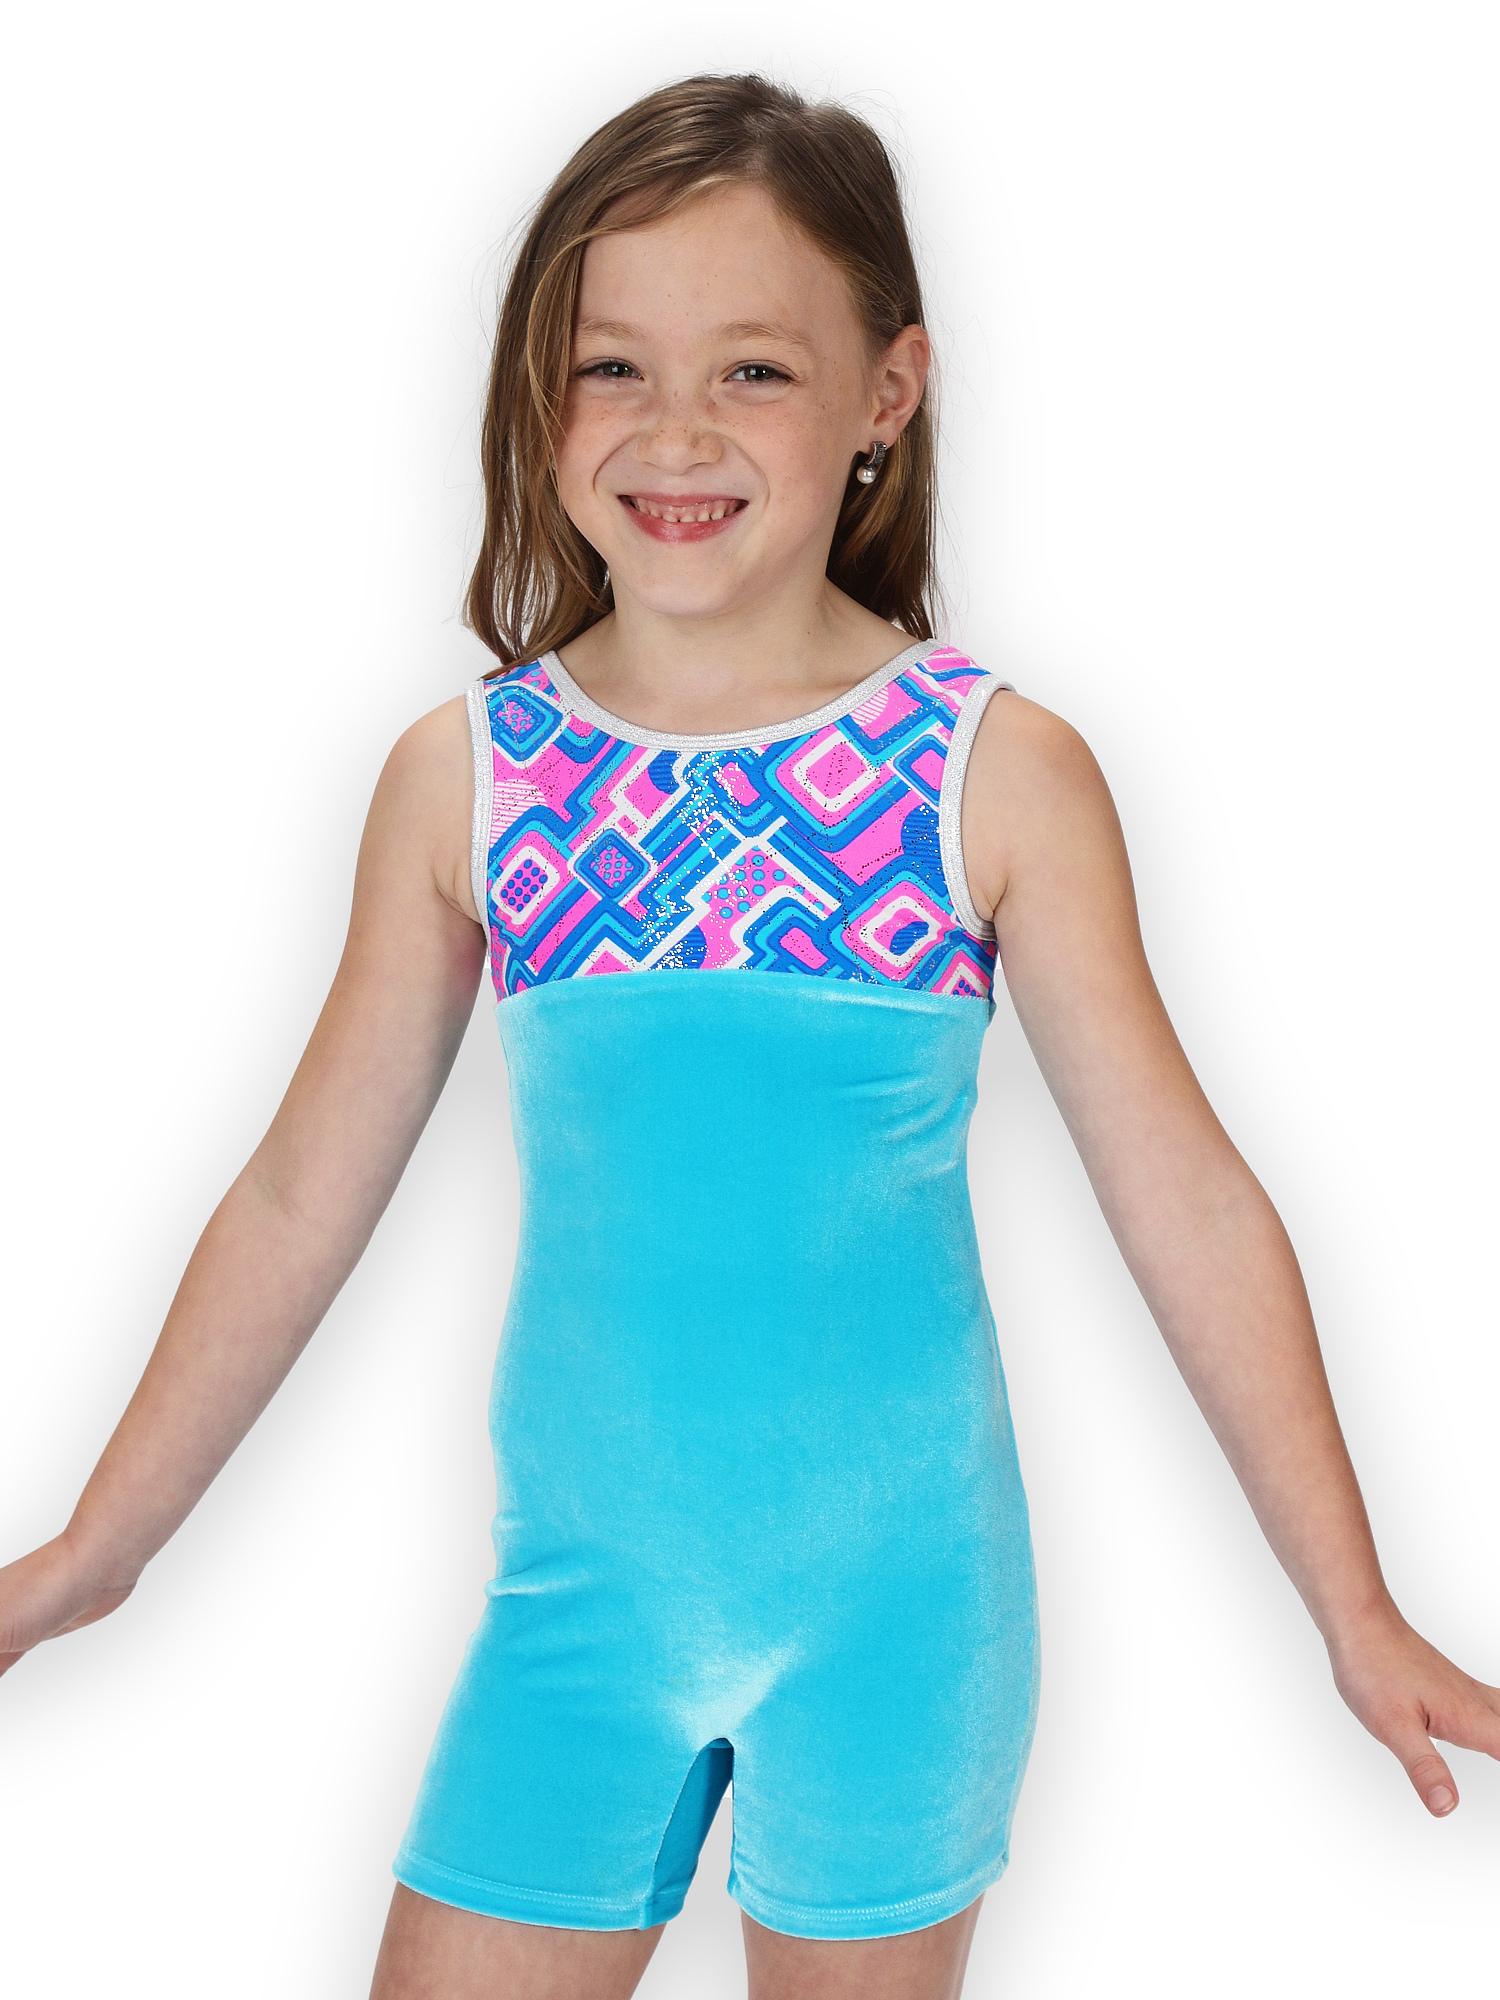 Gymnastics Biketard for Girls - A-Maze-ing Velvet - Leap Gear - 4 | Child Small